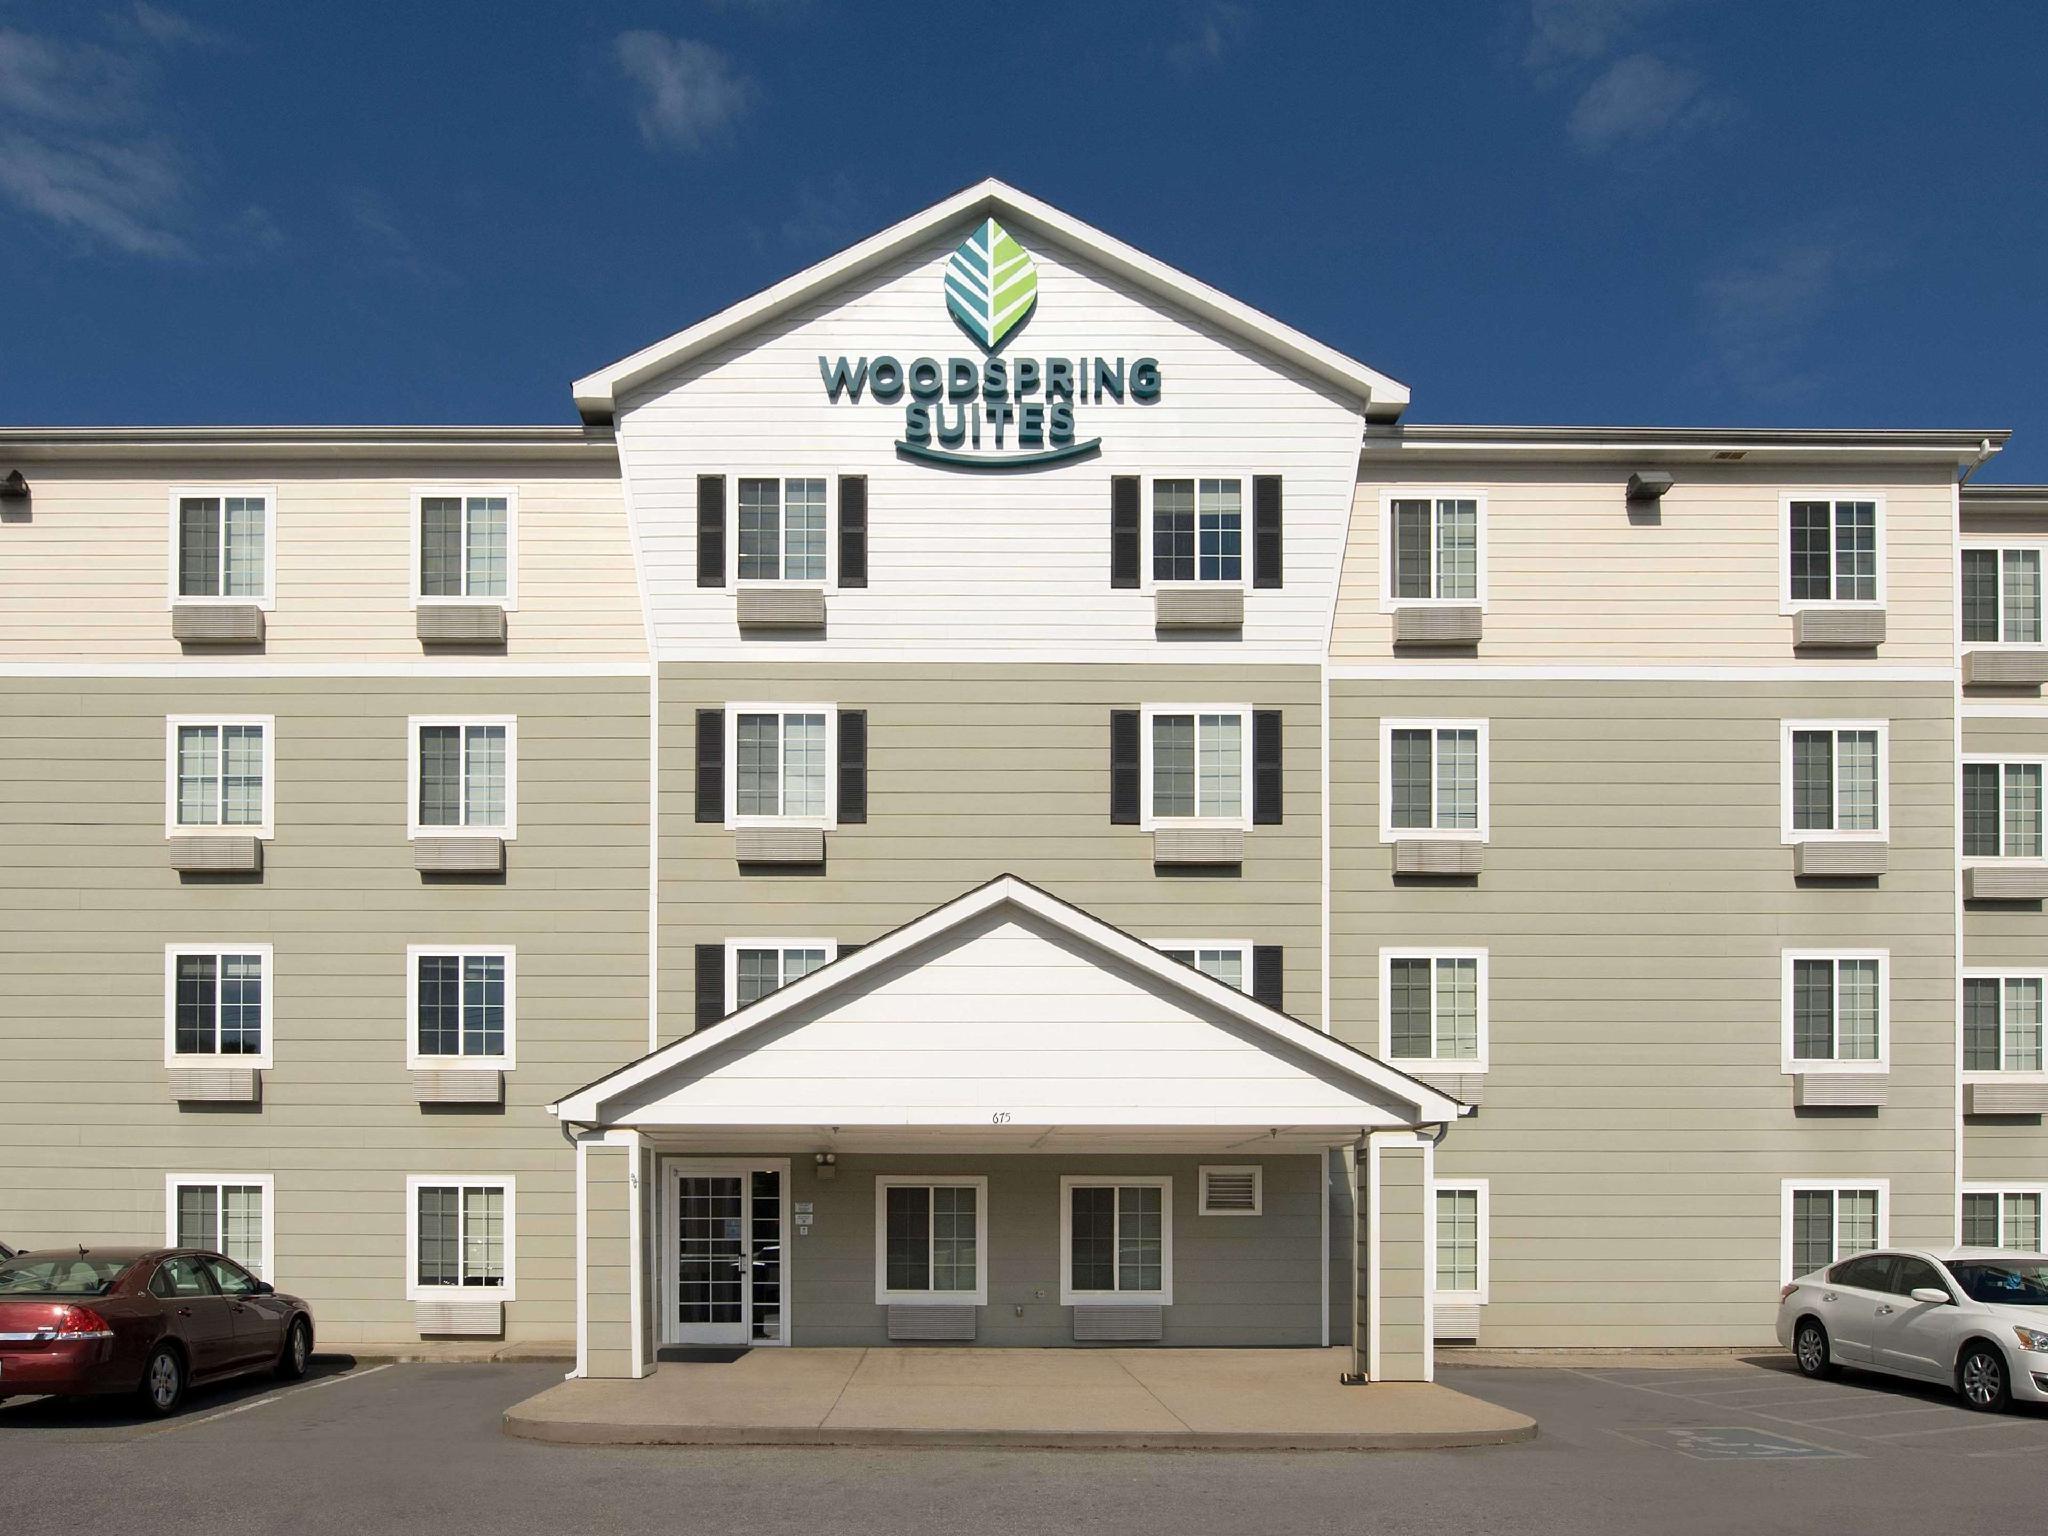 WoodSpring Suites Clarksville Ft. Campbell